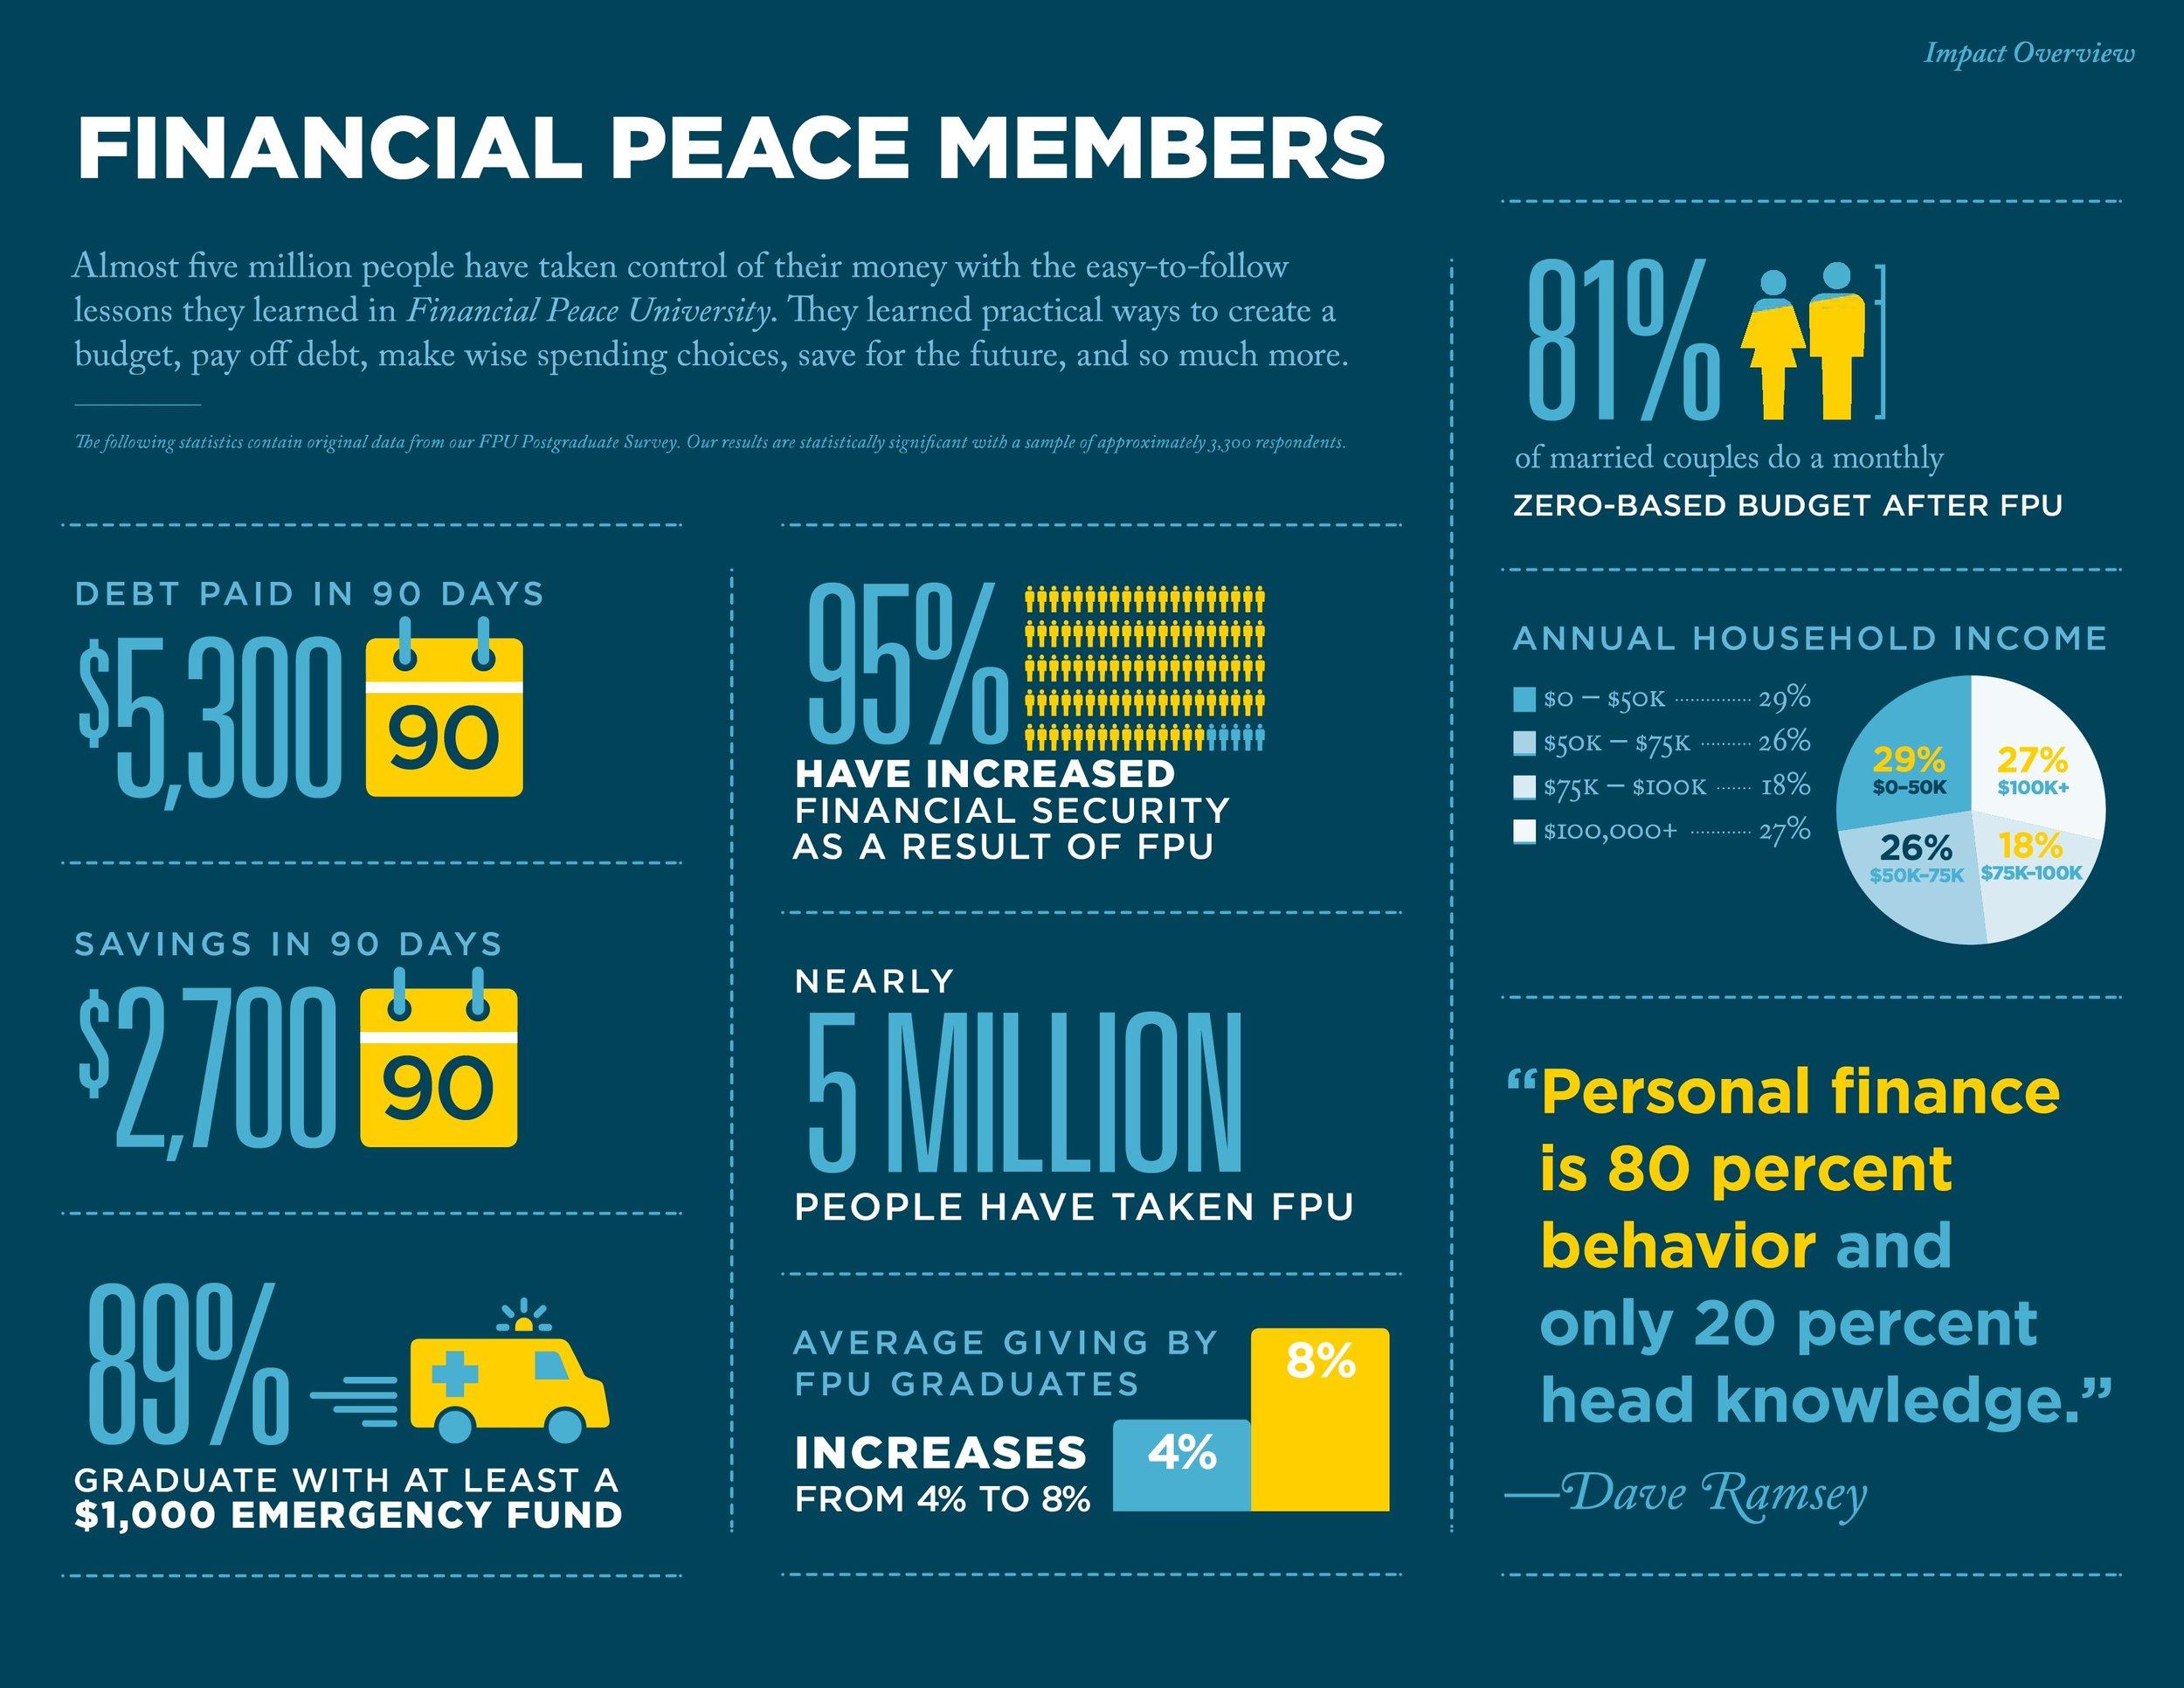 FPU Financial Peace members (2).jpg